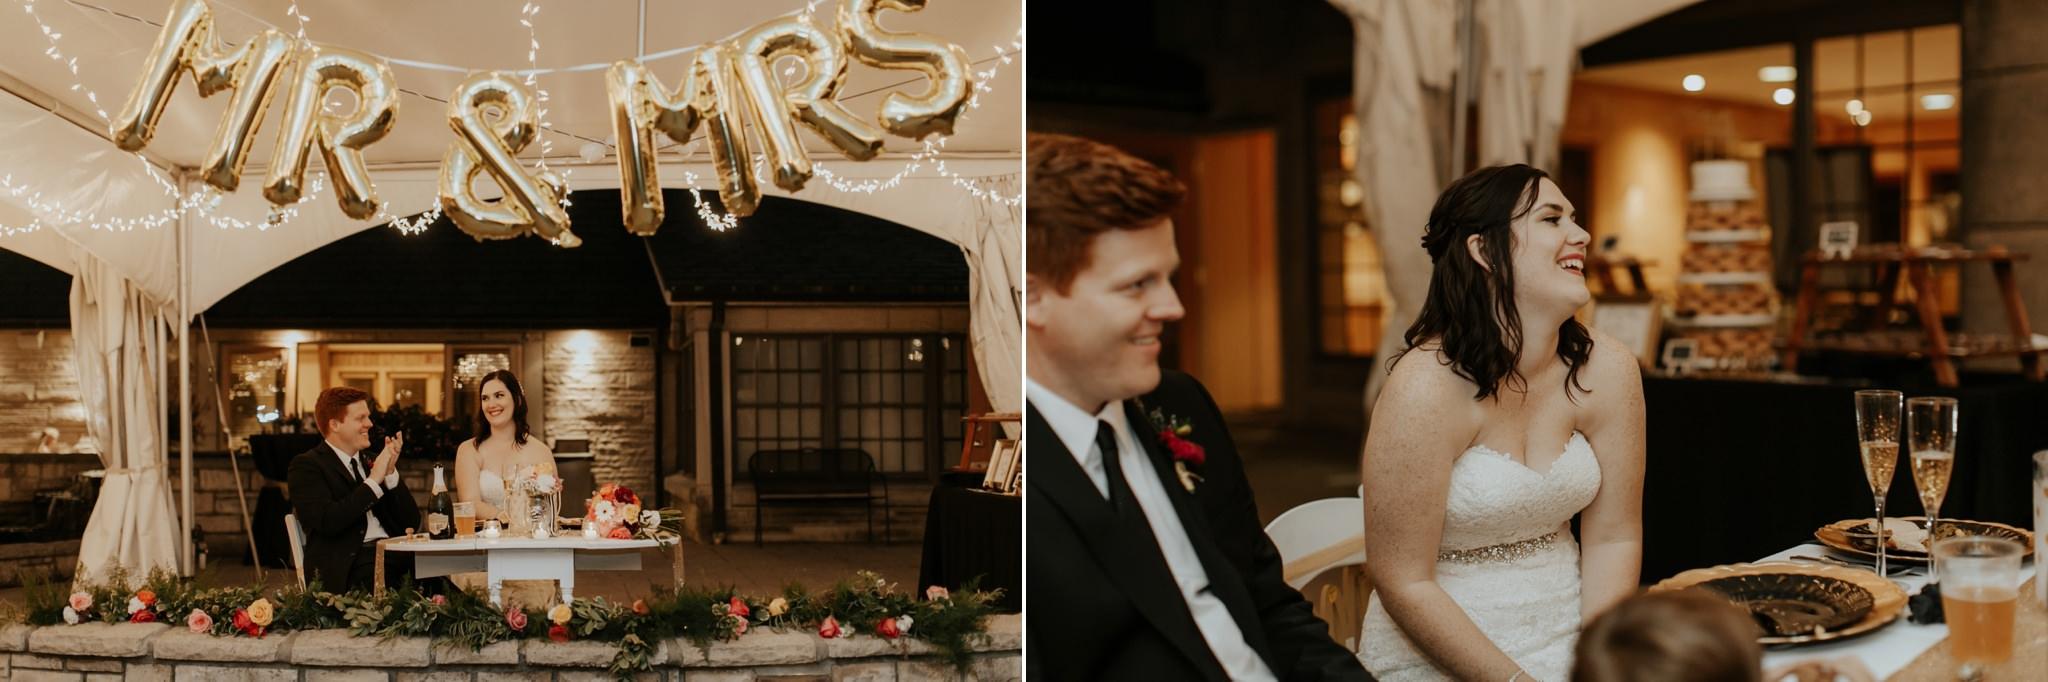 17-09-15 Lindsey and Brandon Wedding Edited-847_WEB.jpg